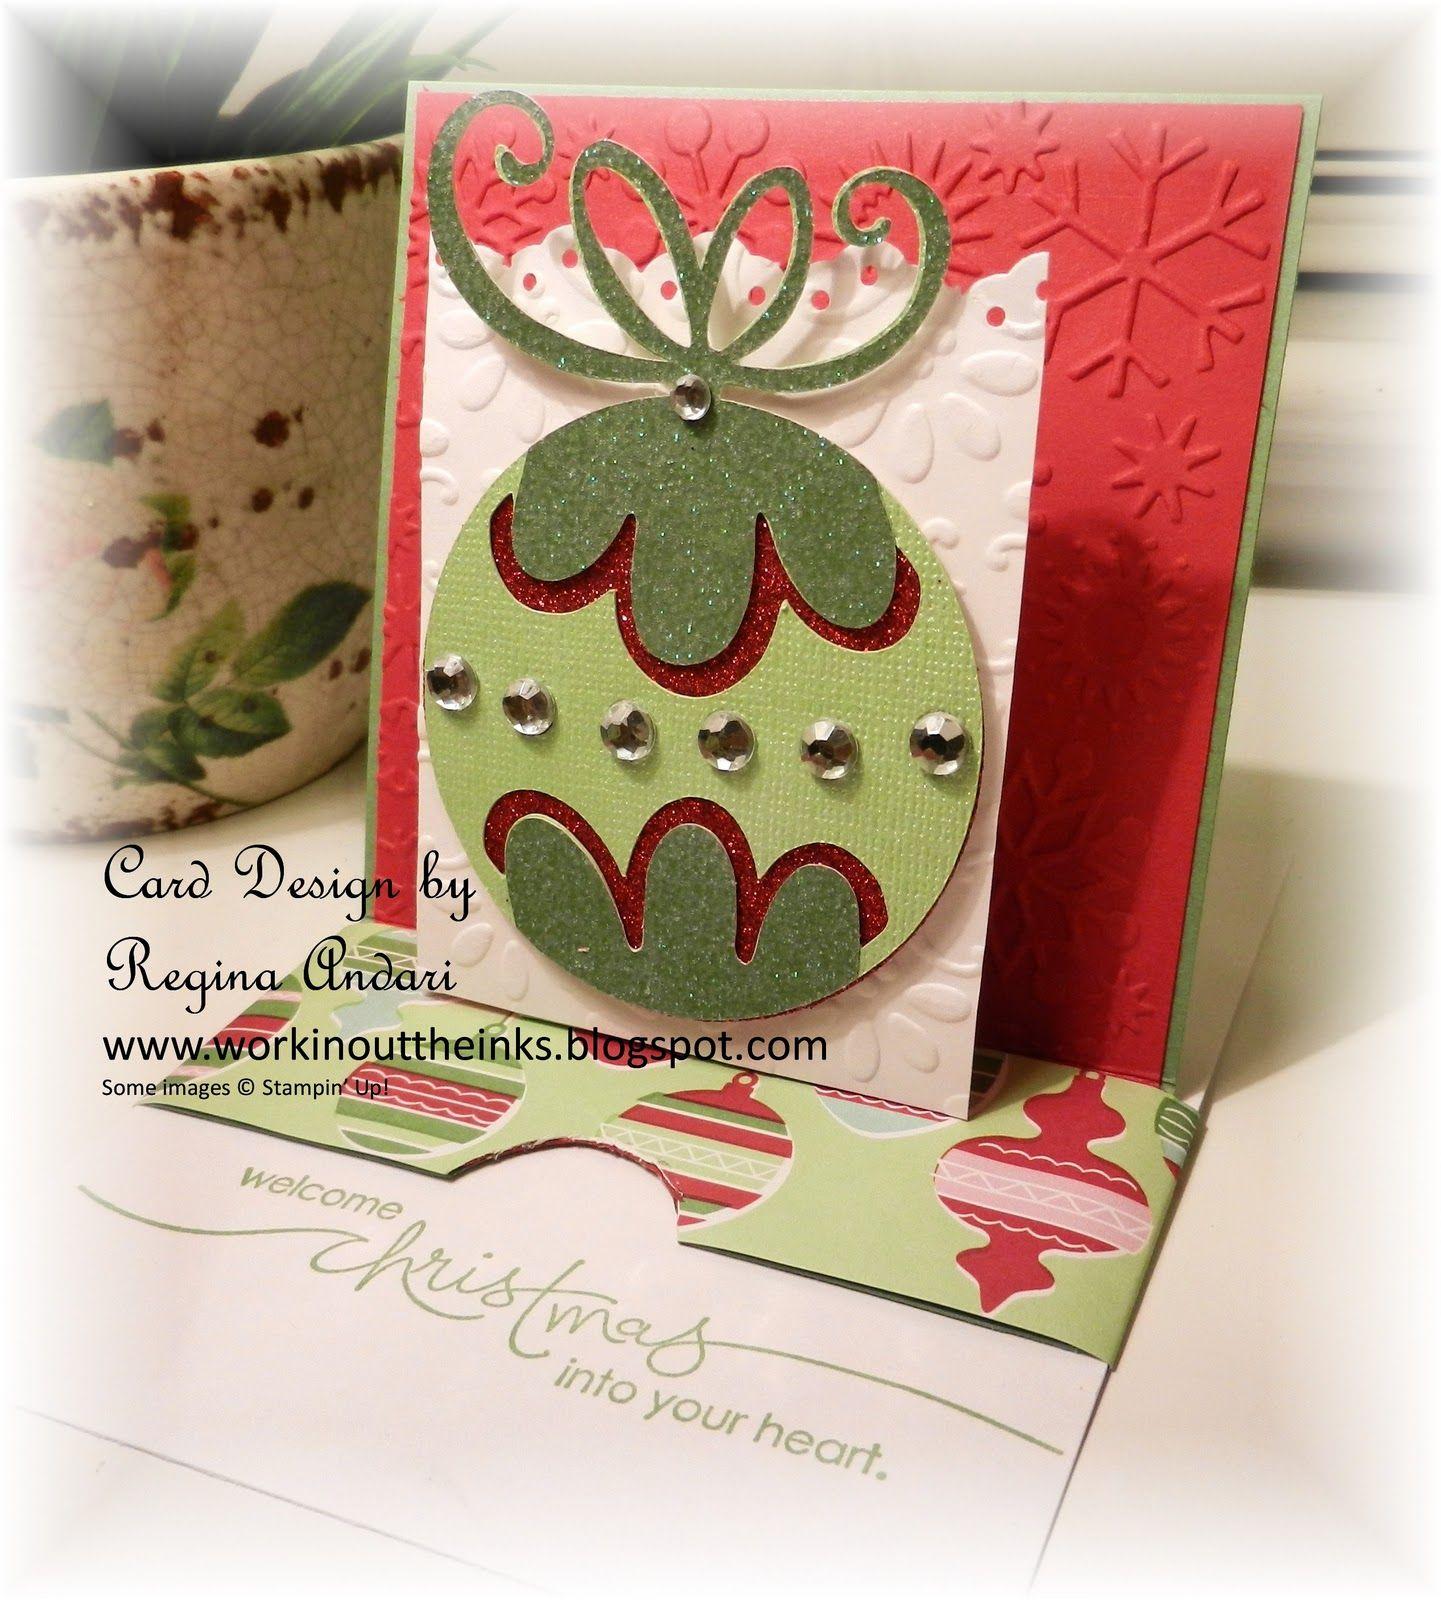 Cricut Christmas Card Ideas Pinterest | www.topsimages.com